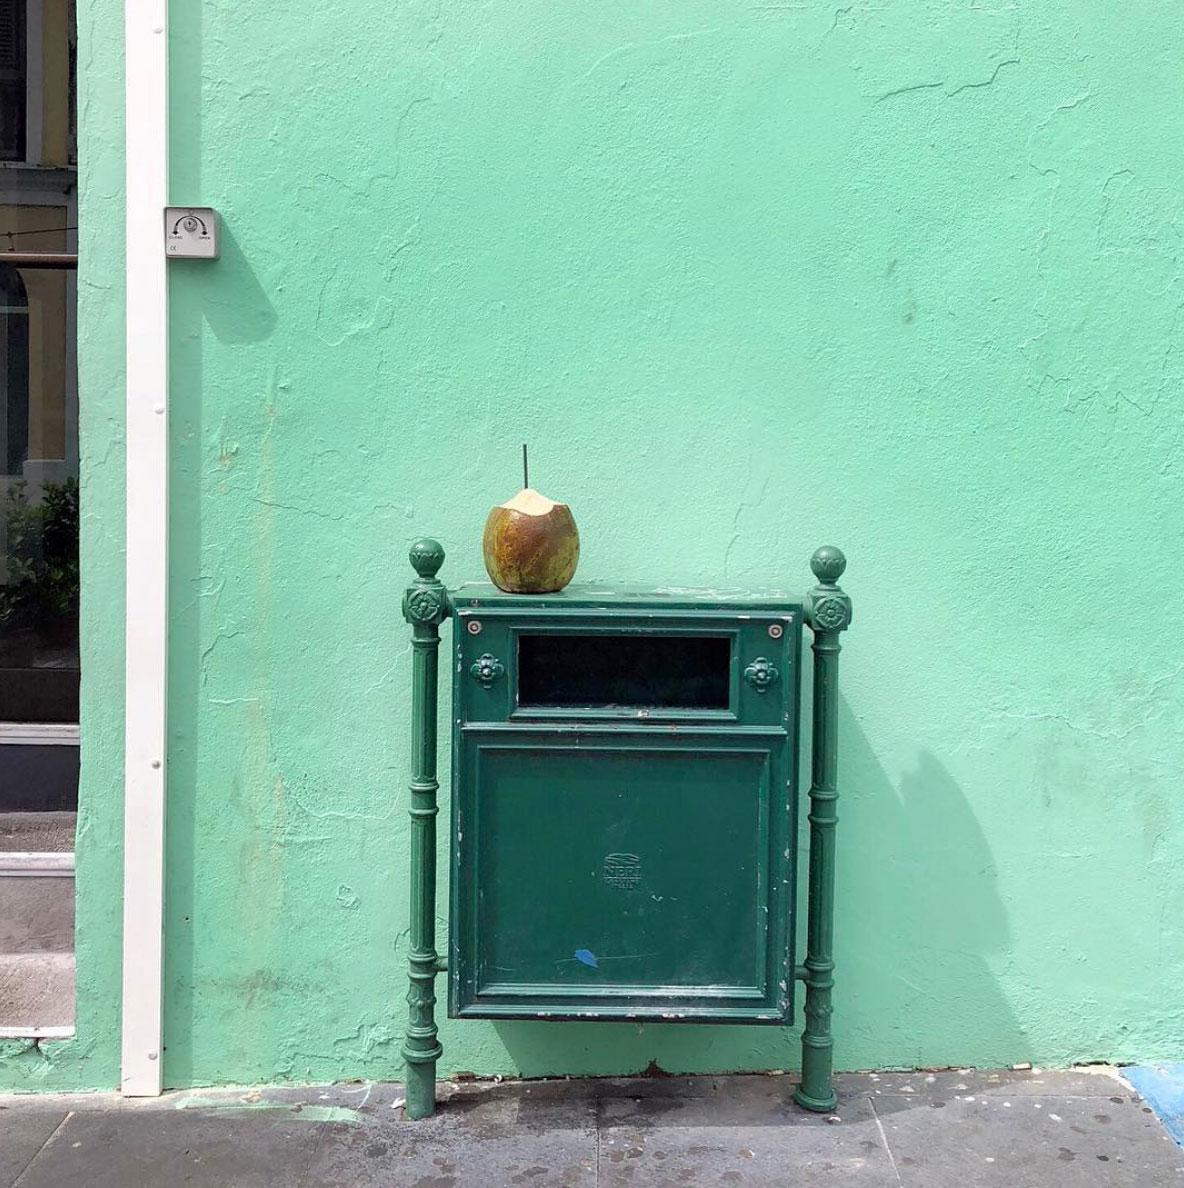 Coconut on a trash can, San Juan, Puerto Rico